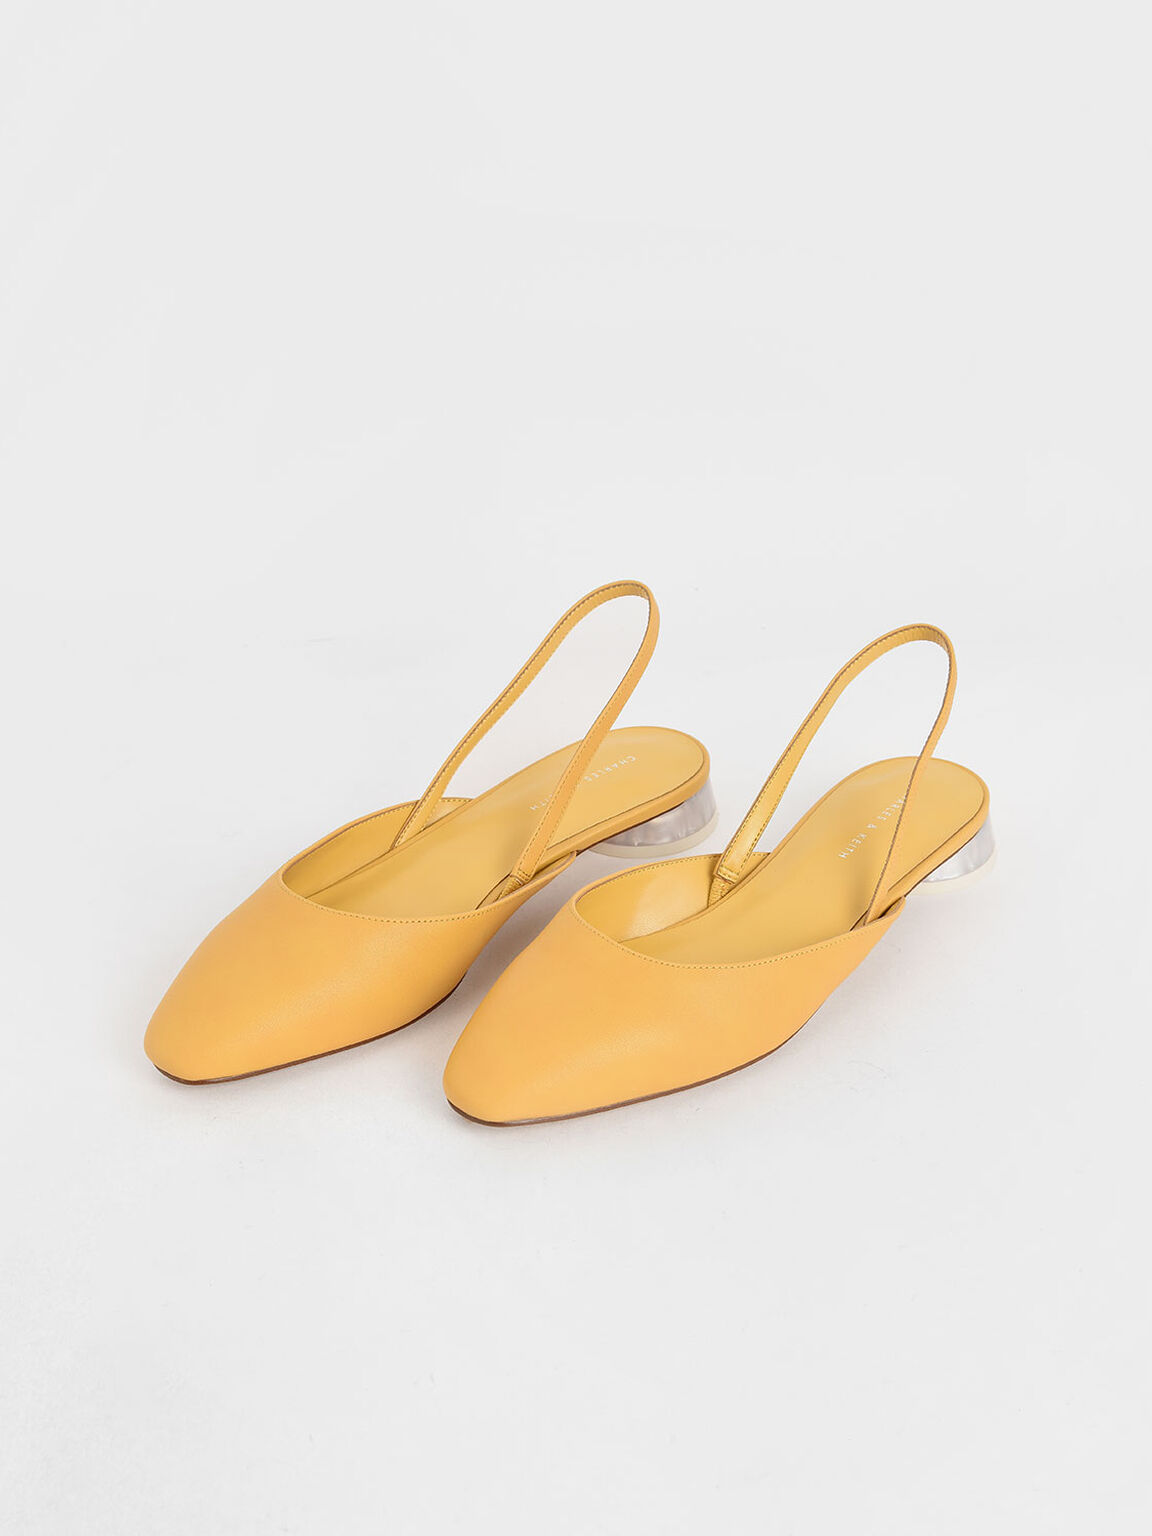 Cylindrical Heel Slingback Pumps, Yellow, hi-res